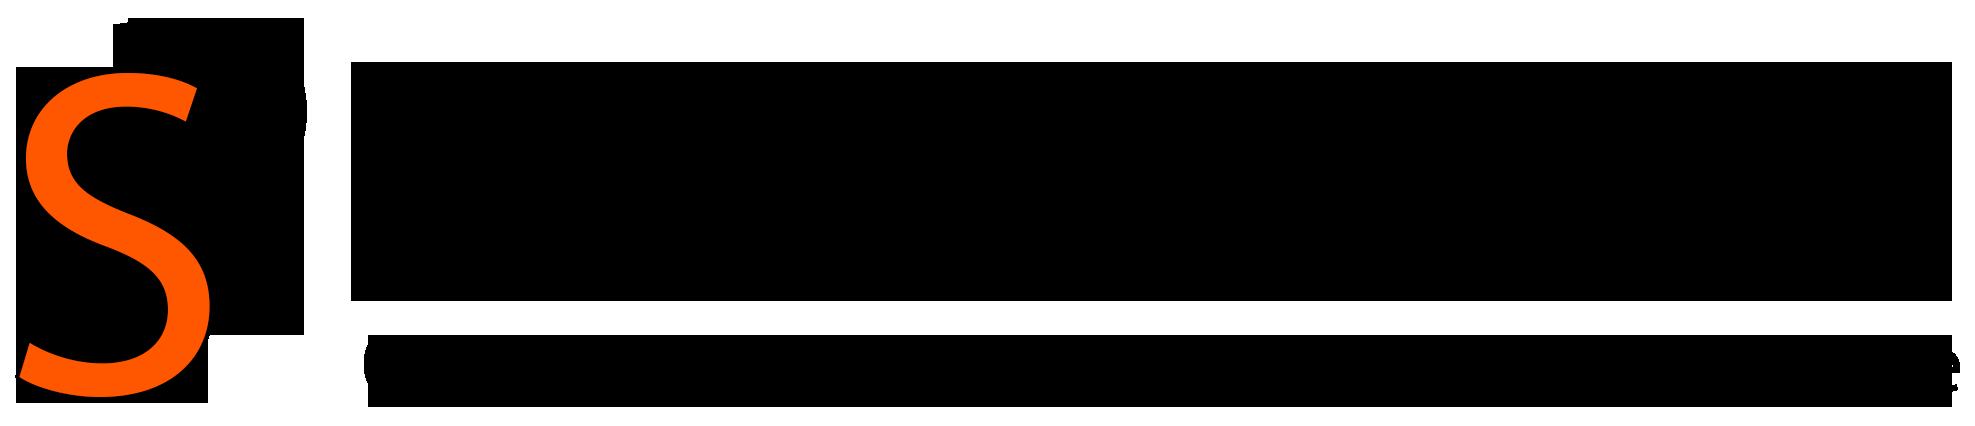 SP Värmepumpservice